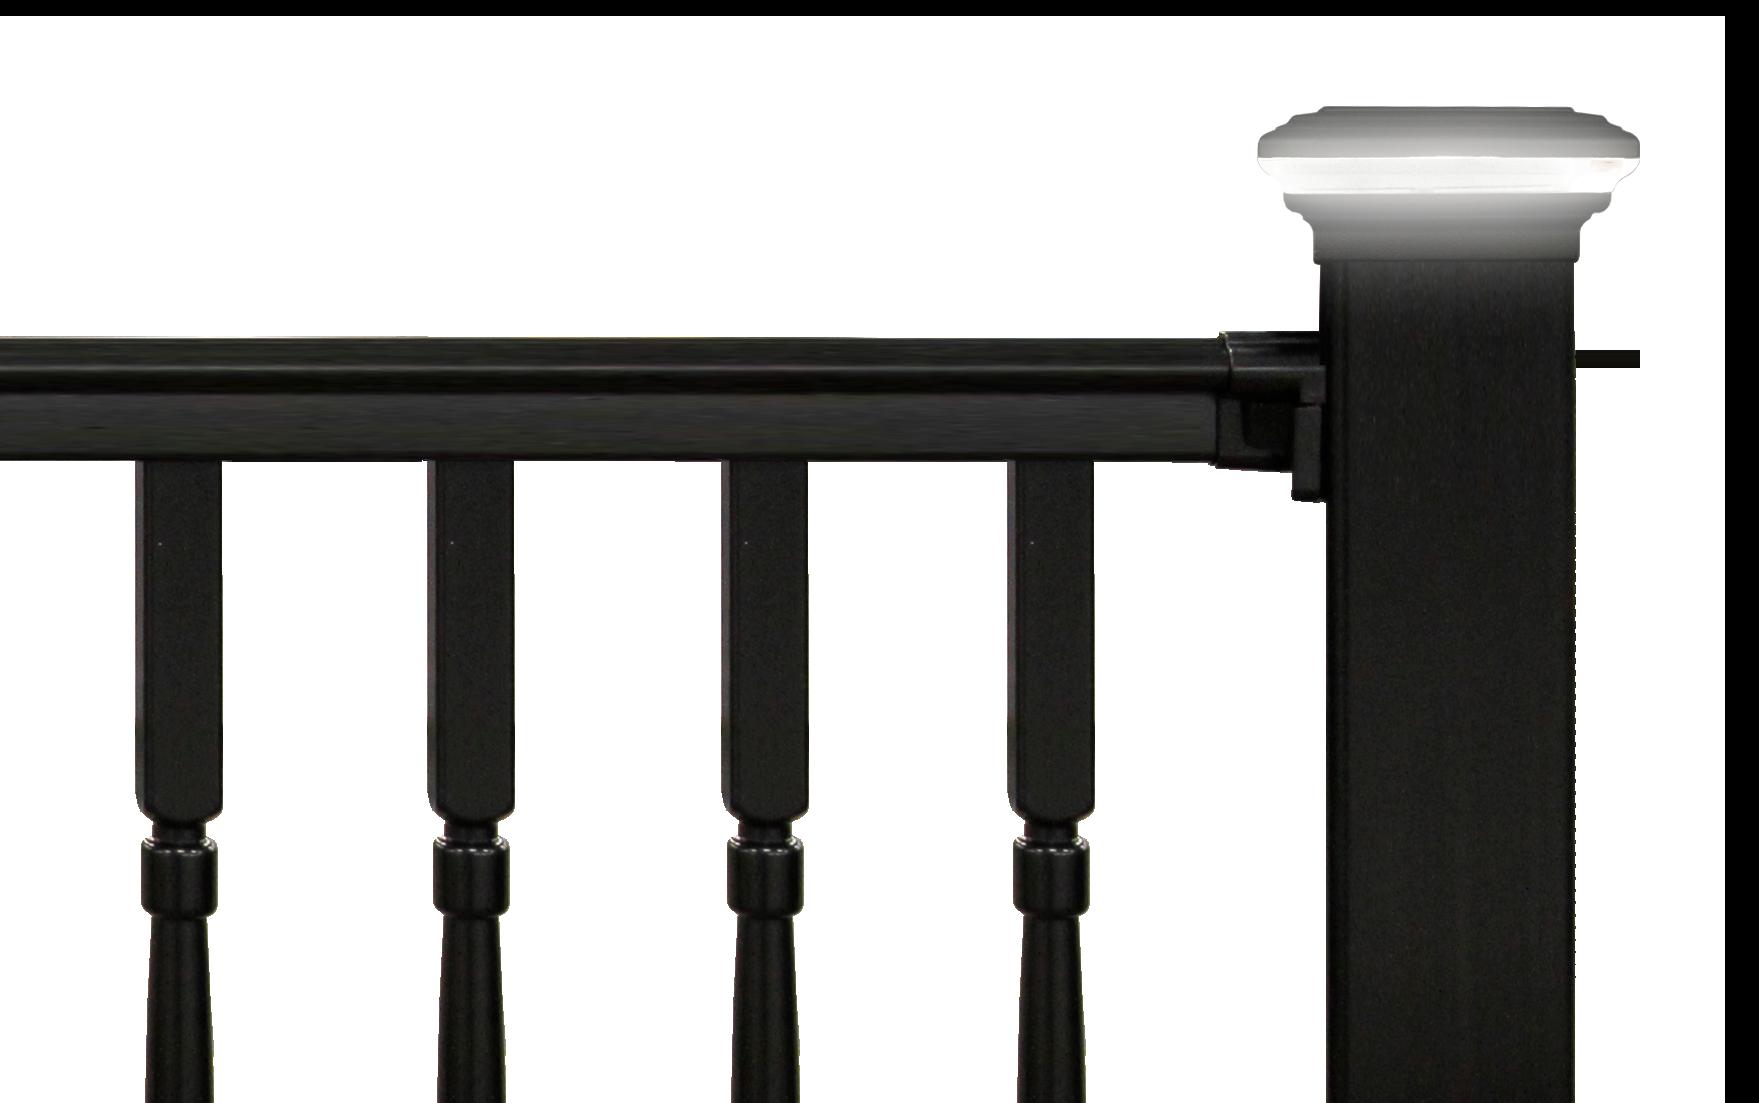 High Quality Decorative Post Cap Light on Deck Railing- Placid Point Lighting - Outdoor LED Lighting